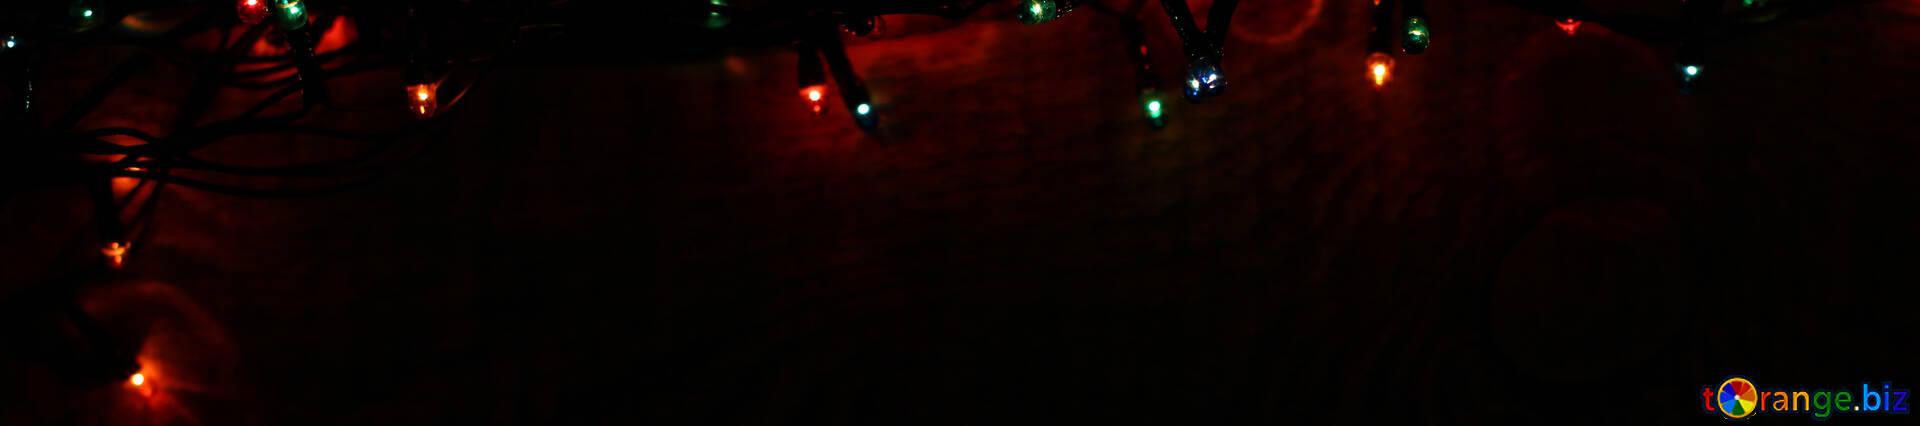 Covers For Social Networks Cover Of Christmas Lights Desktop